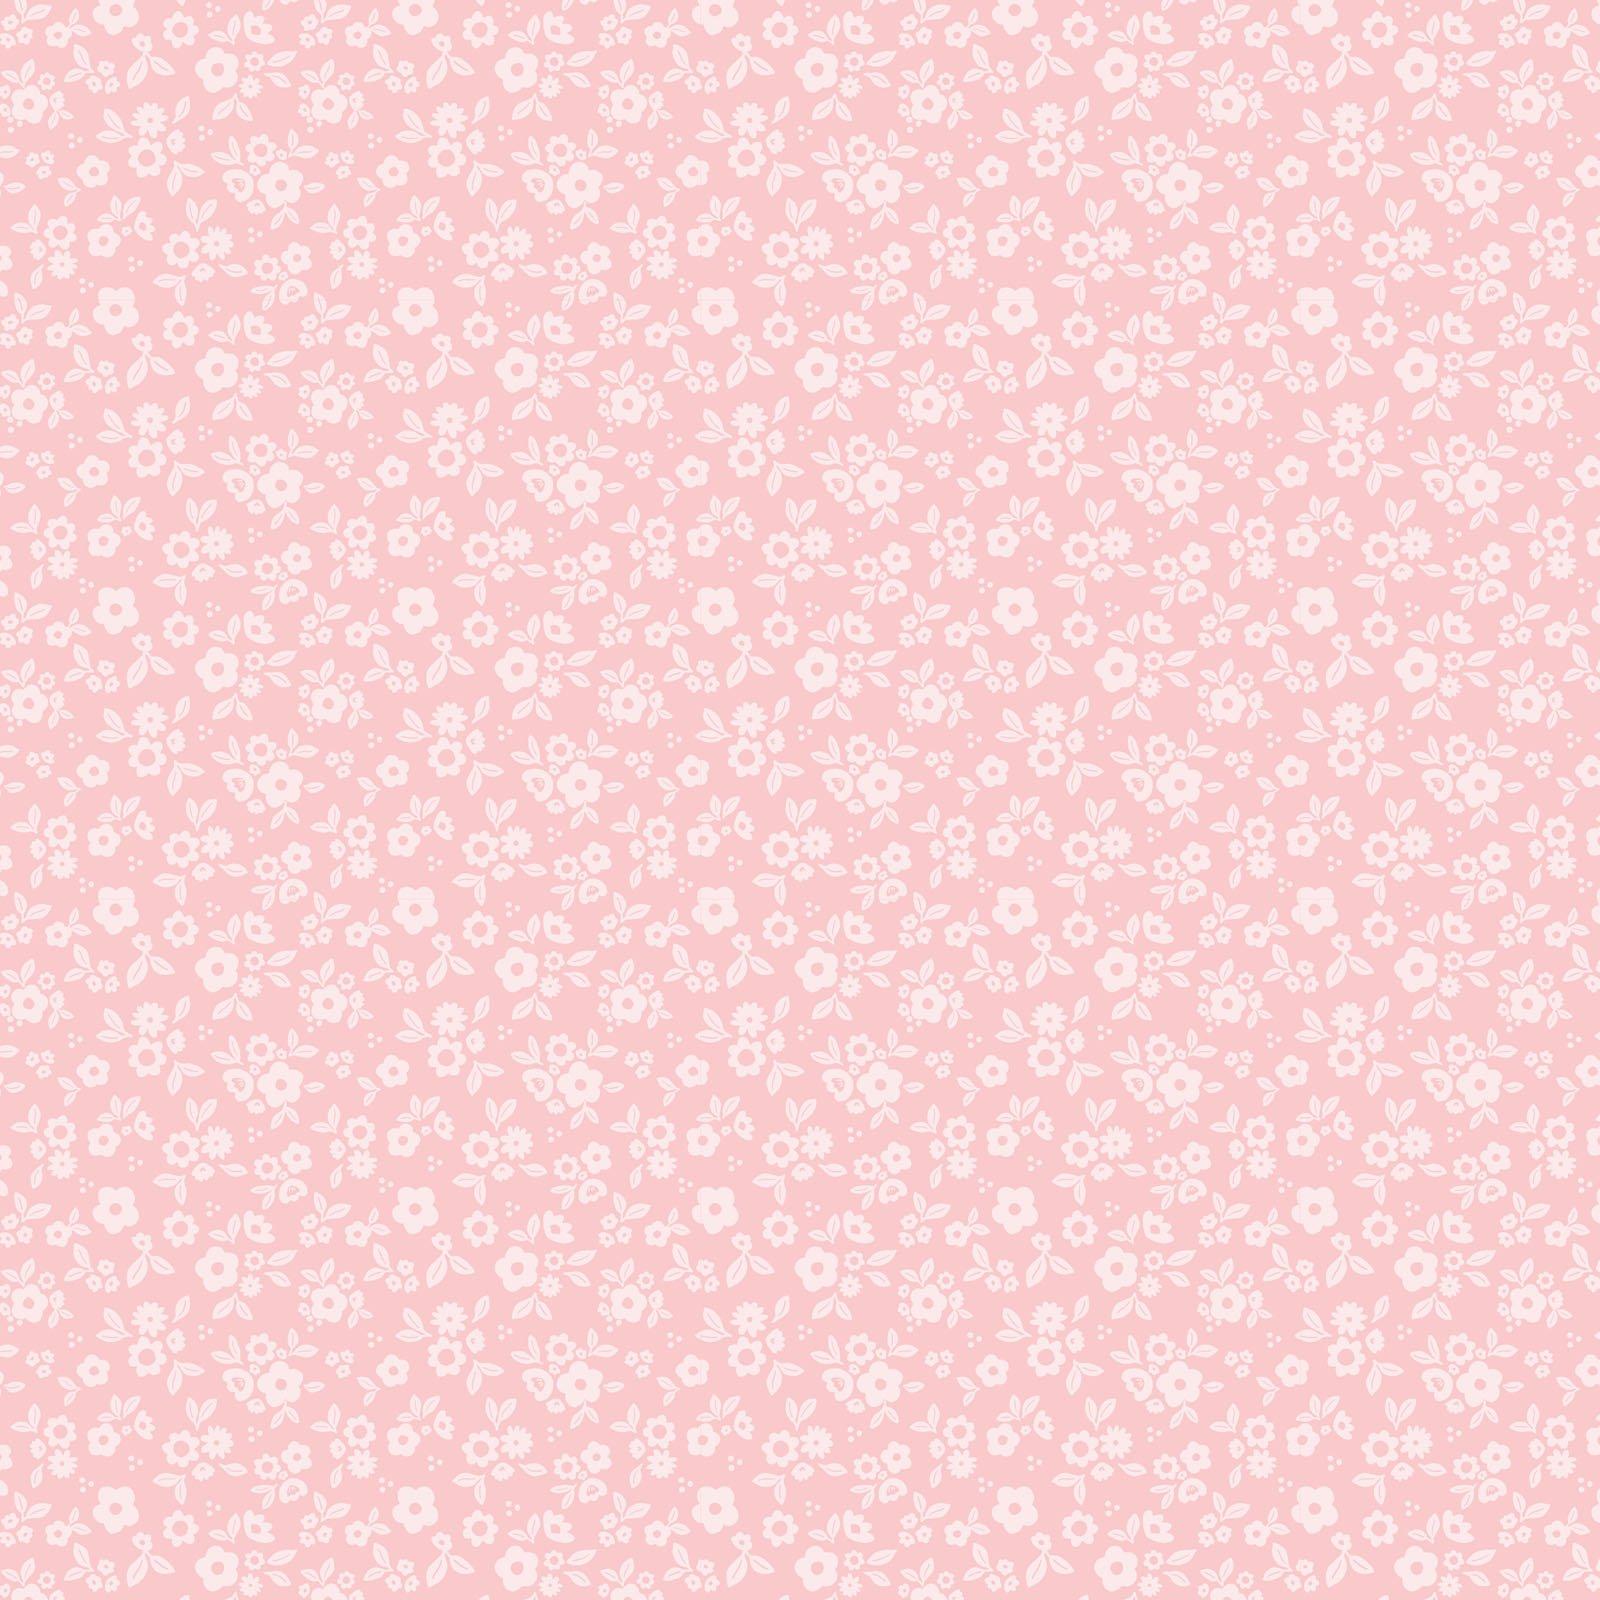 Goose Creek Garden Soft Breeze Pink